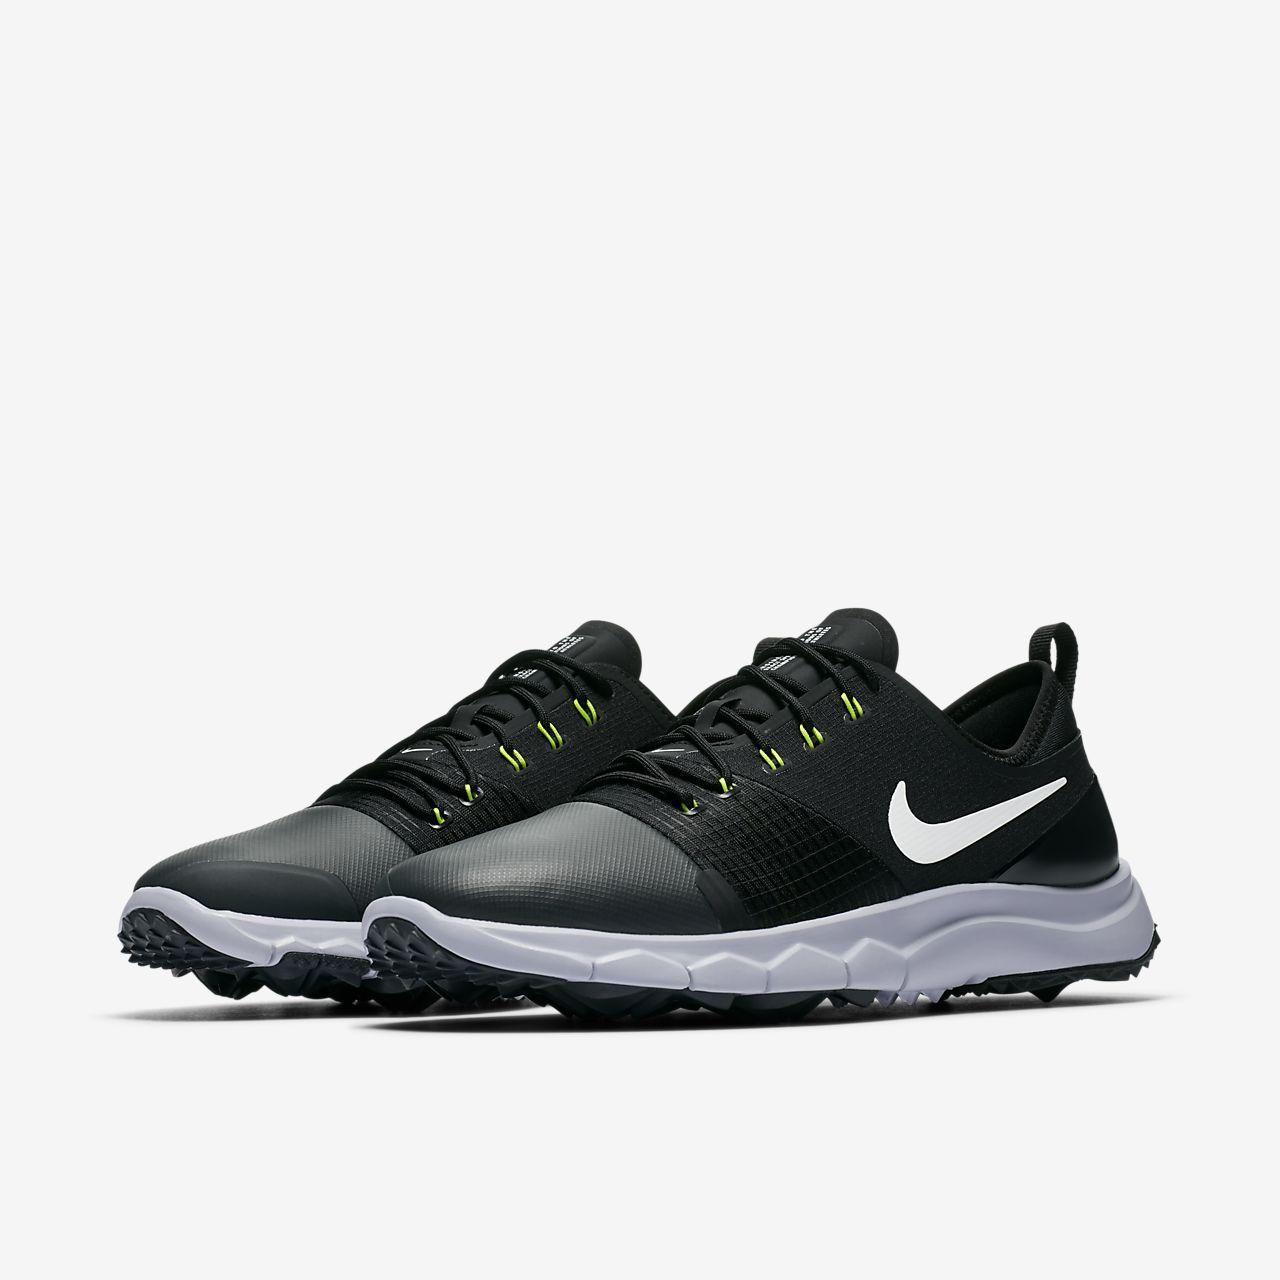 competitive price 79e4a 2e224 ... Nike FI Impact 3 Women s Golf Shoe